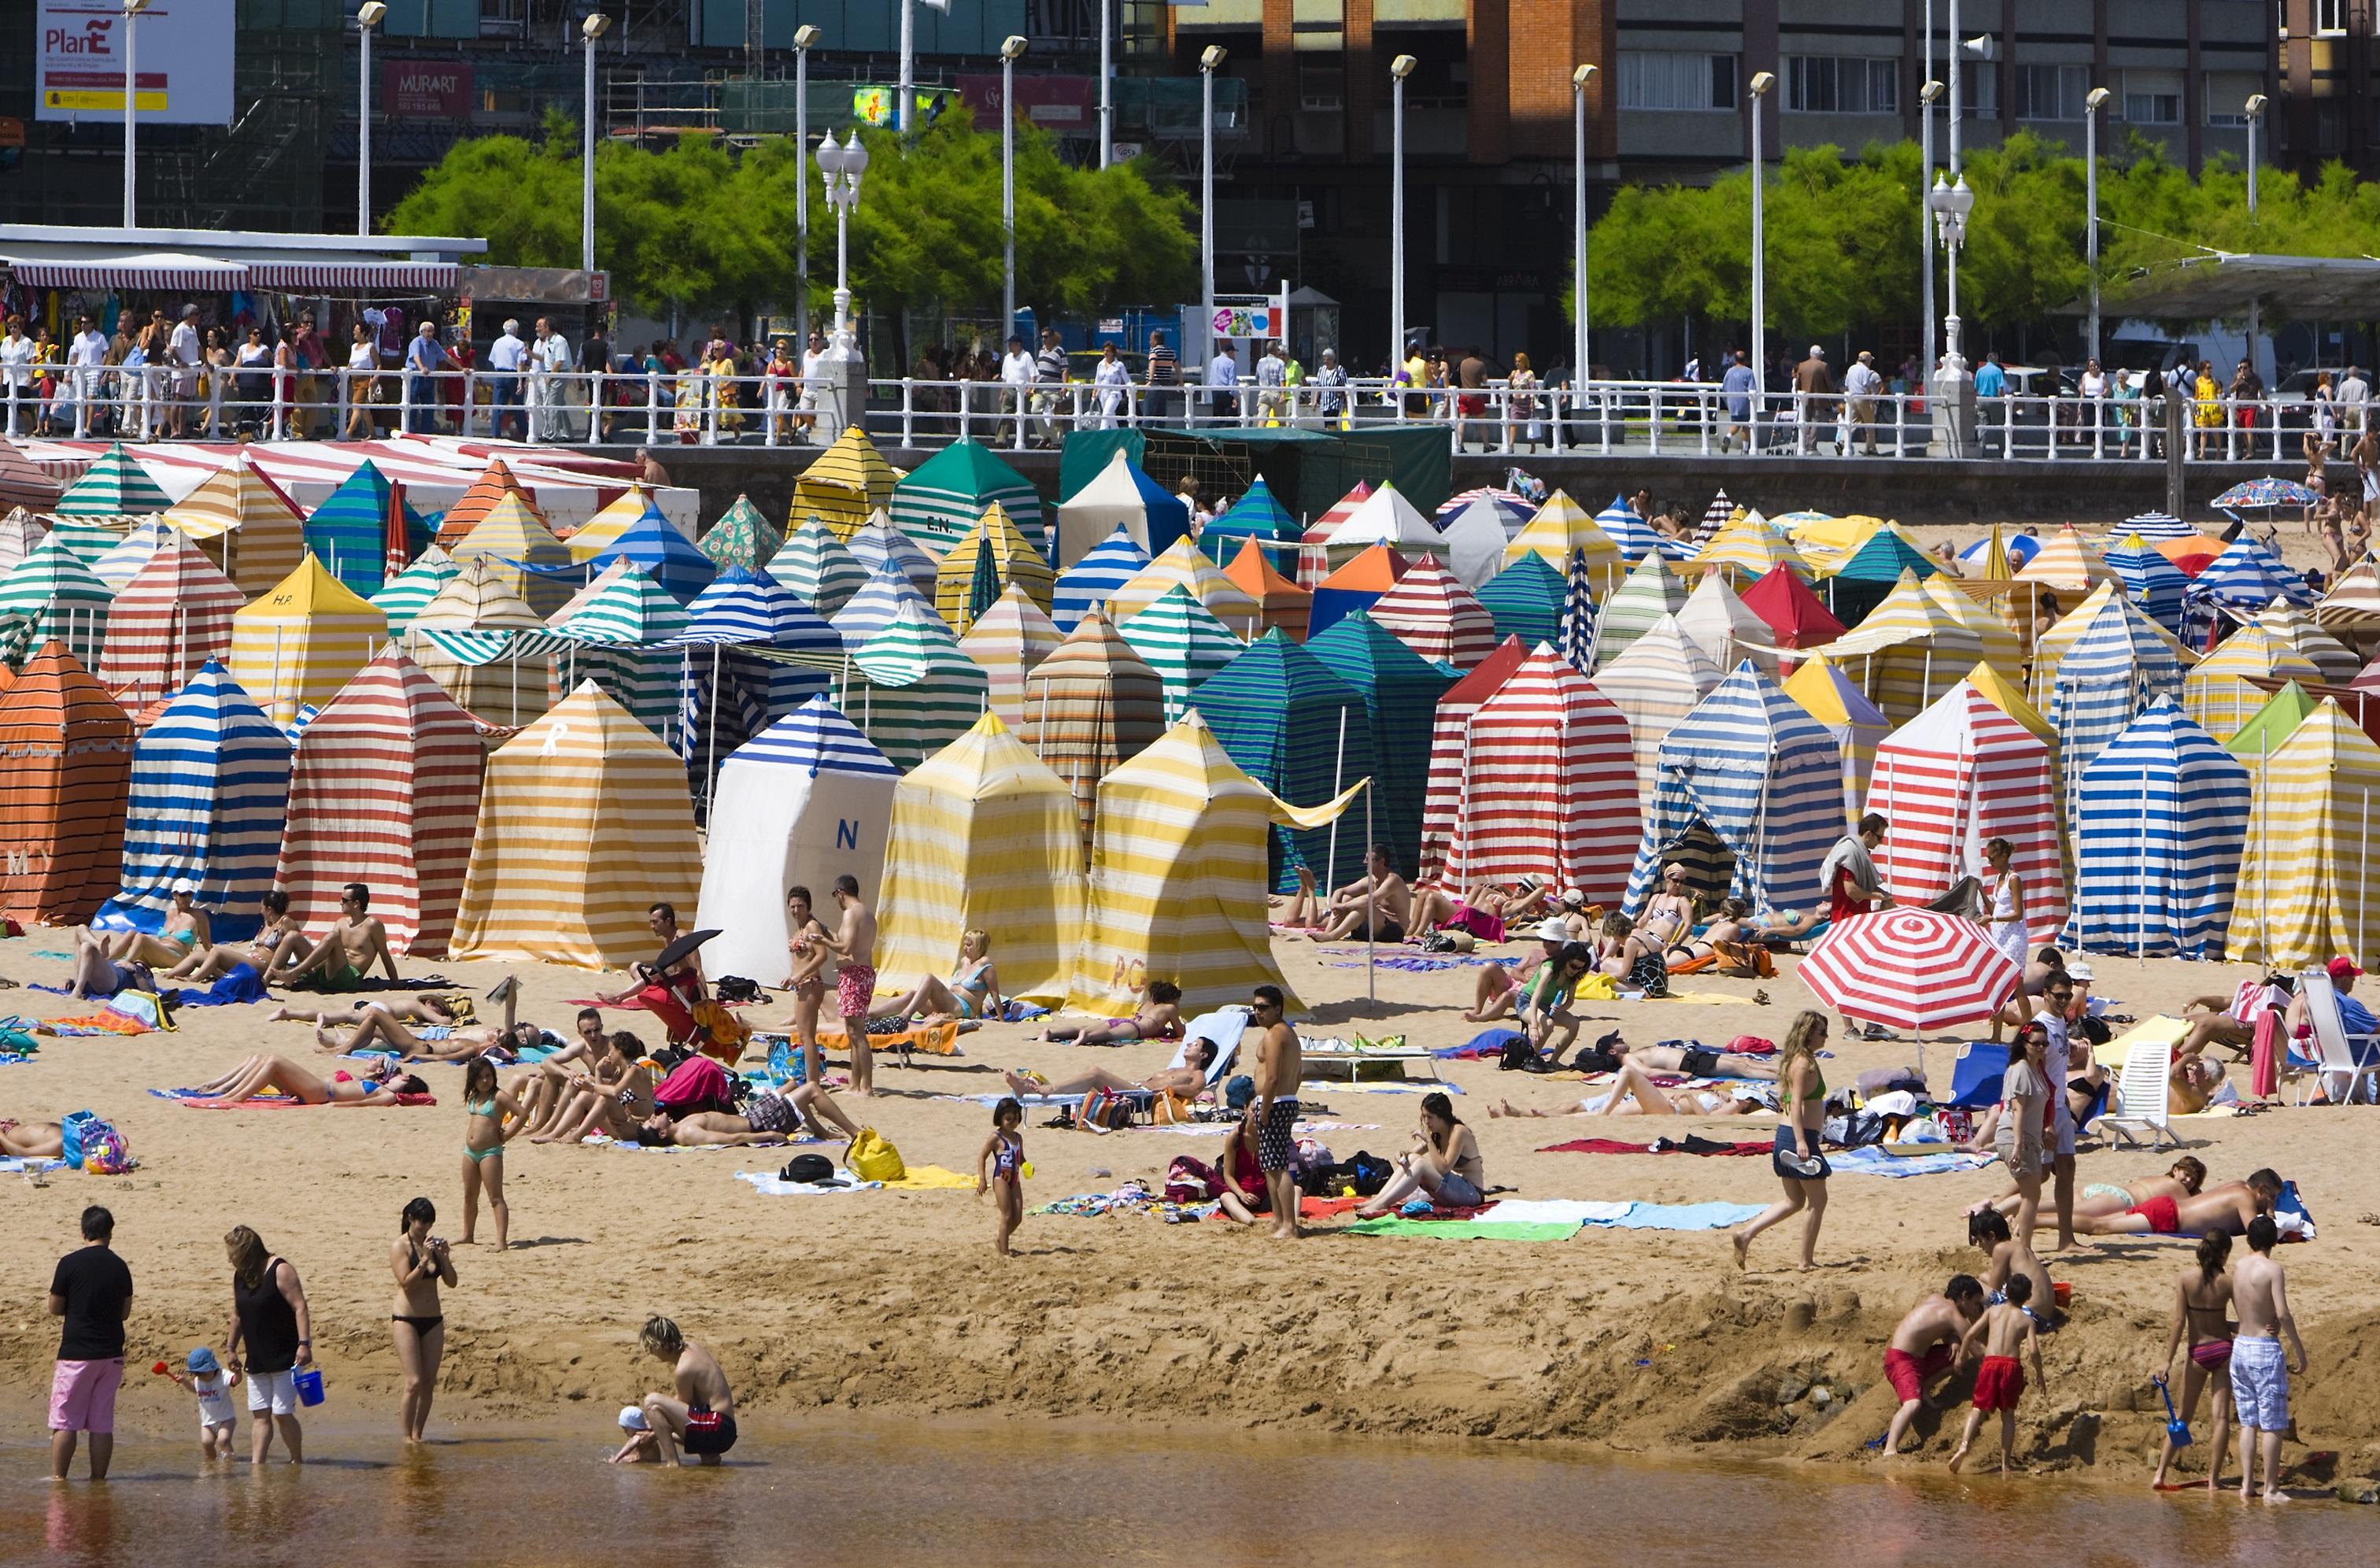 Playa de San Lorenzo, Gijón. Autora, Pilar Azaña